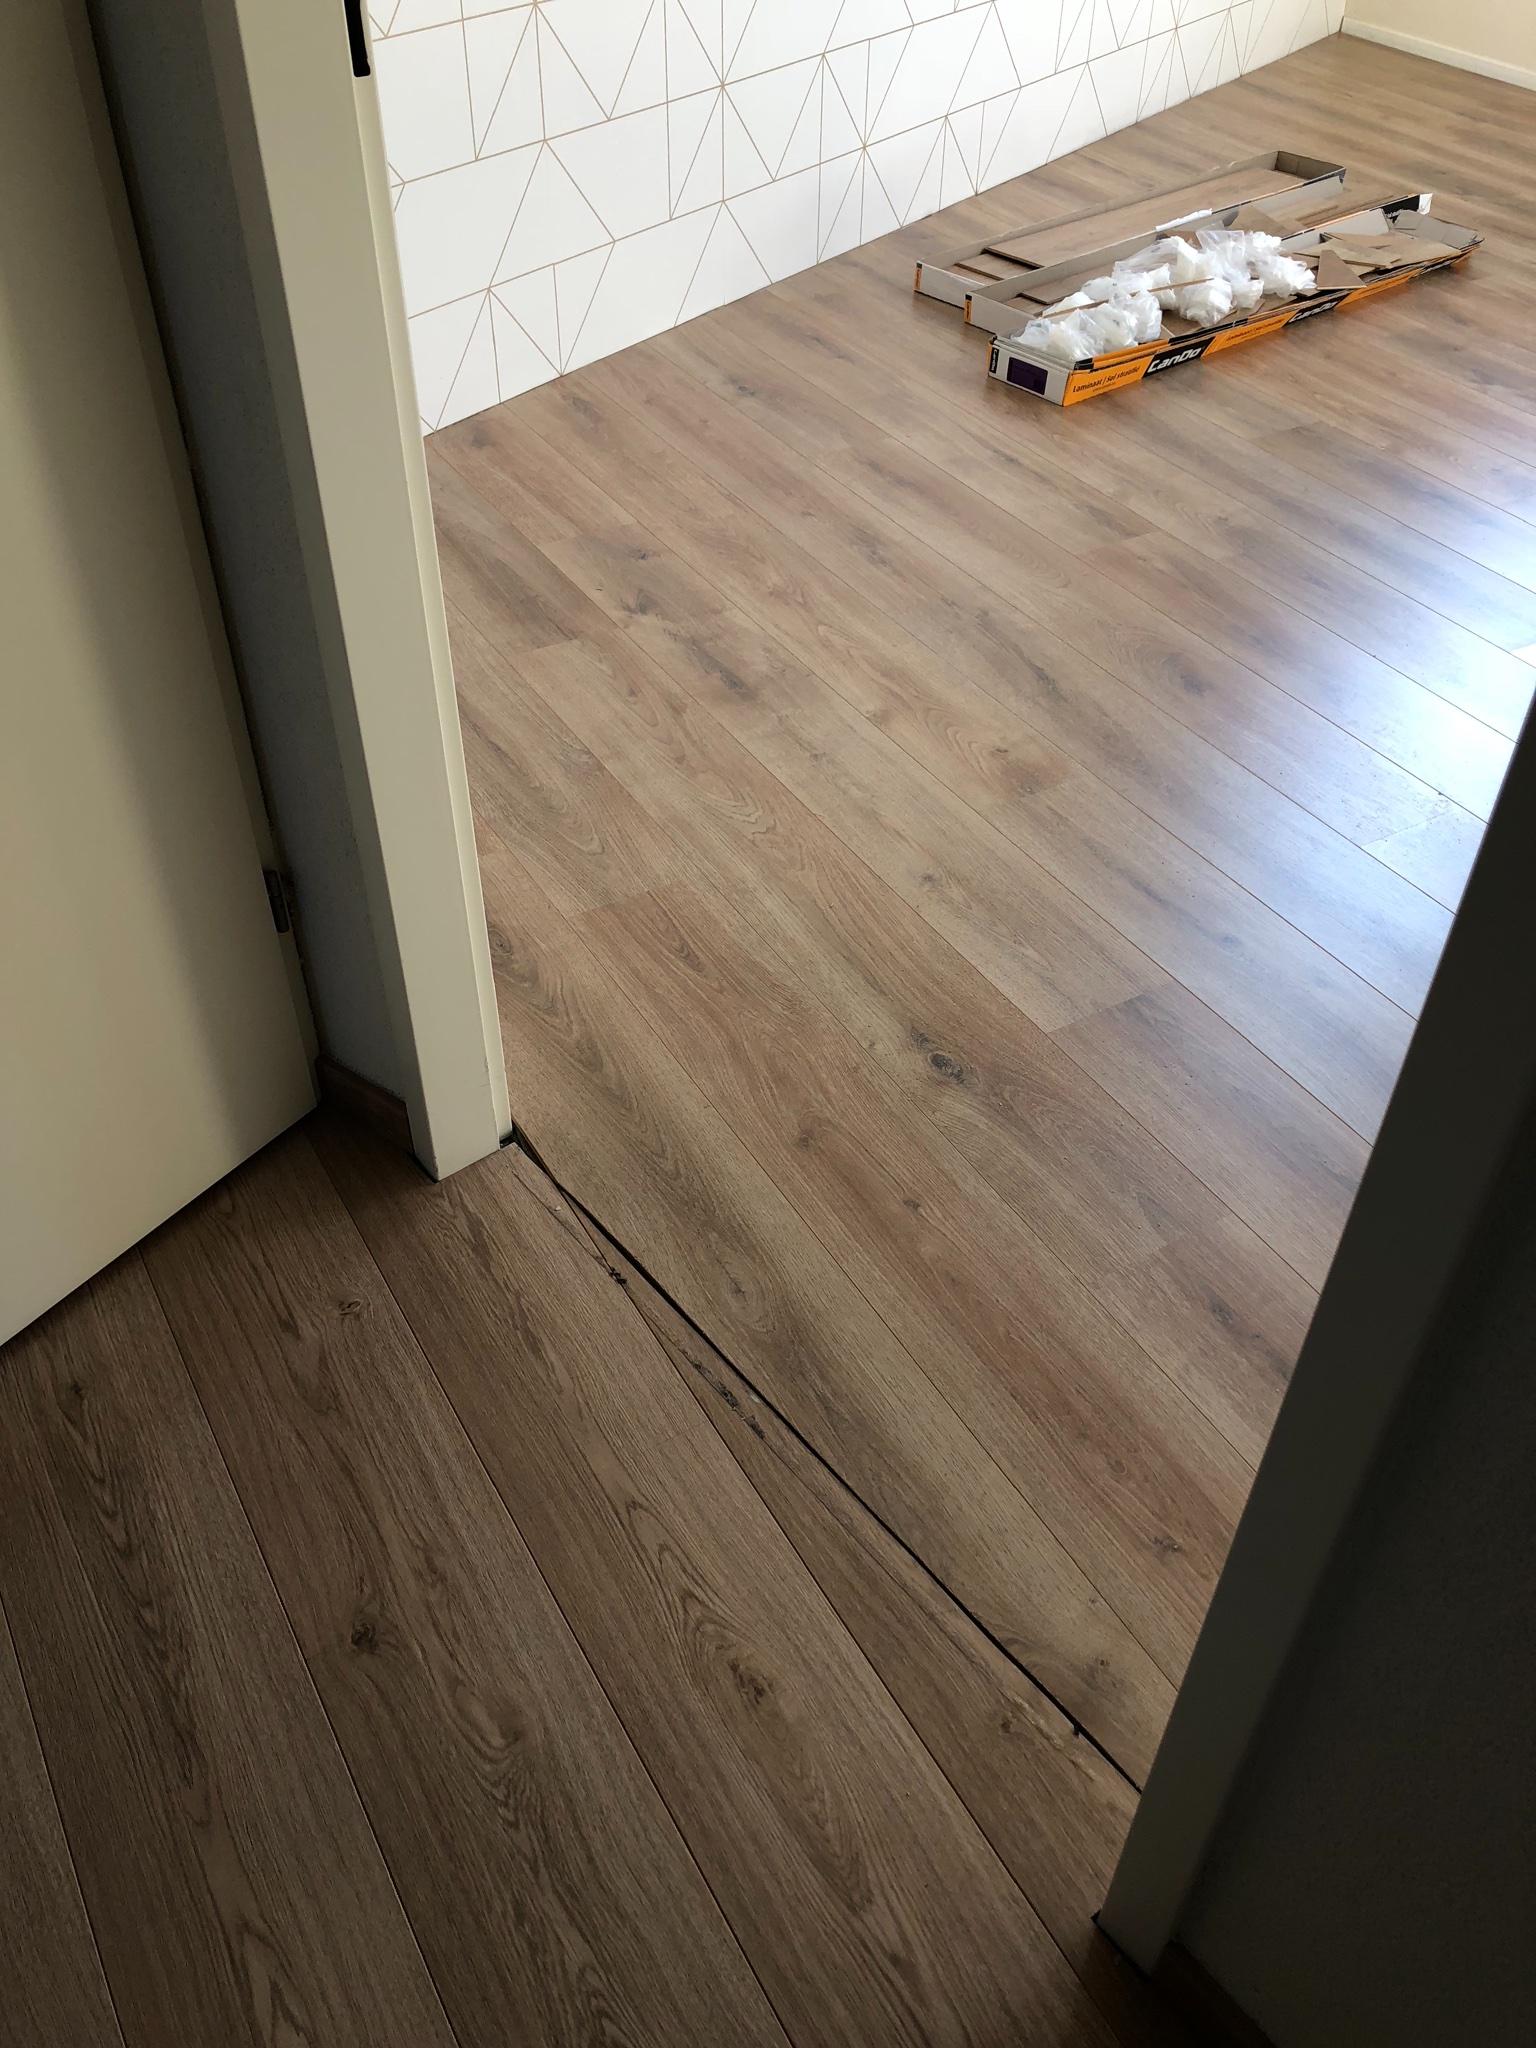 Laminaat leggen (slaapkamer 20m2) - Werkspot